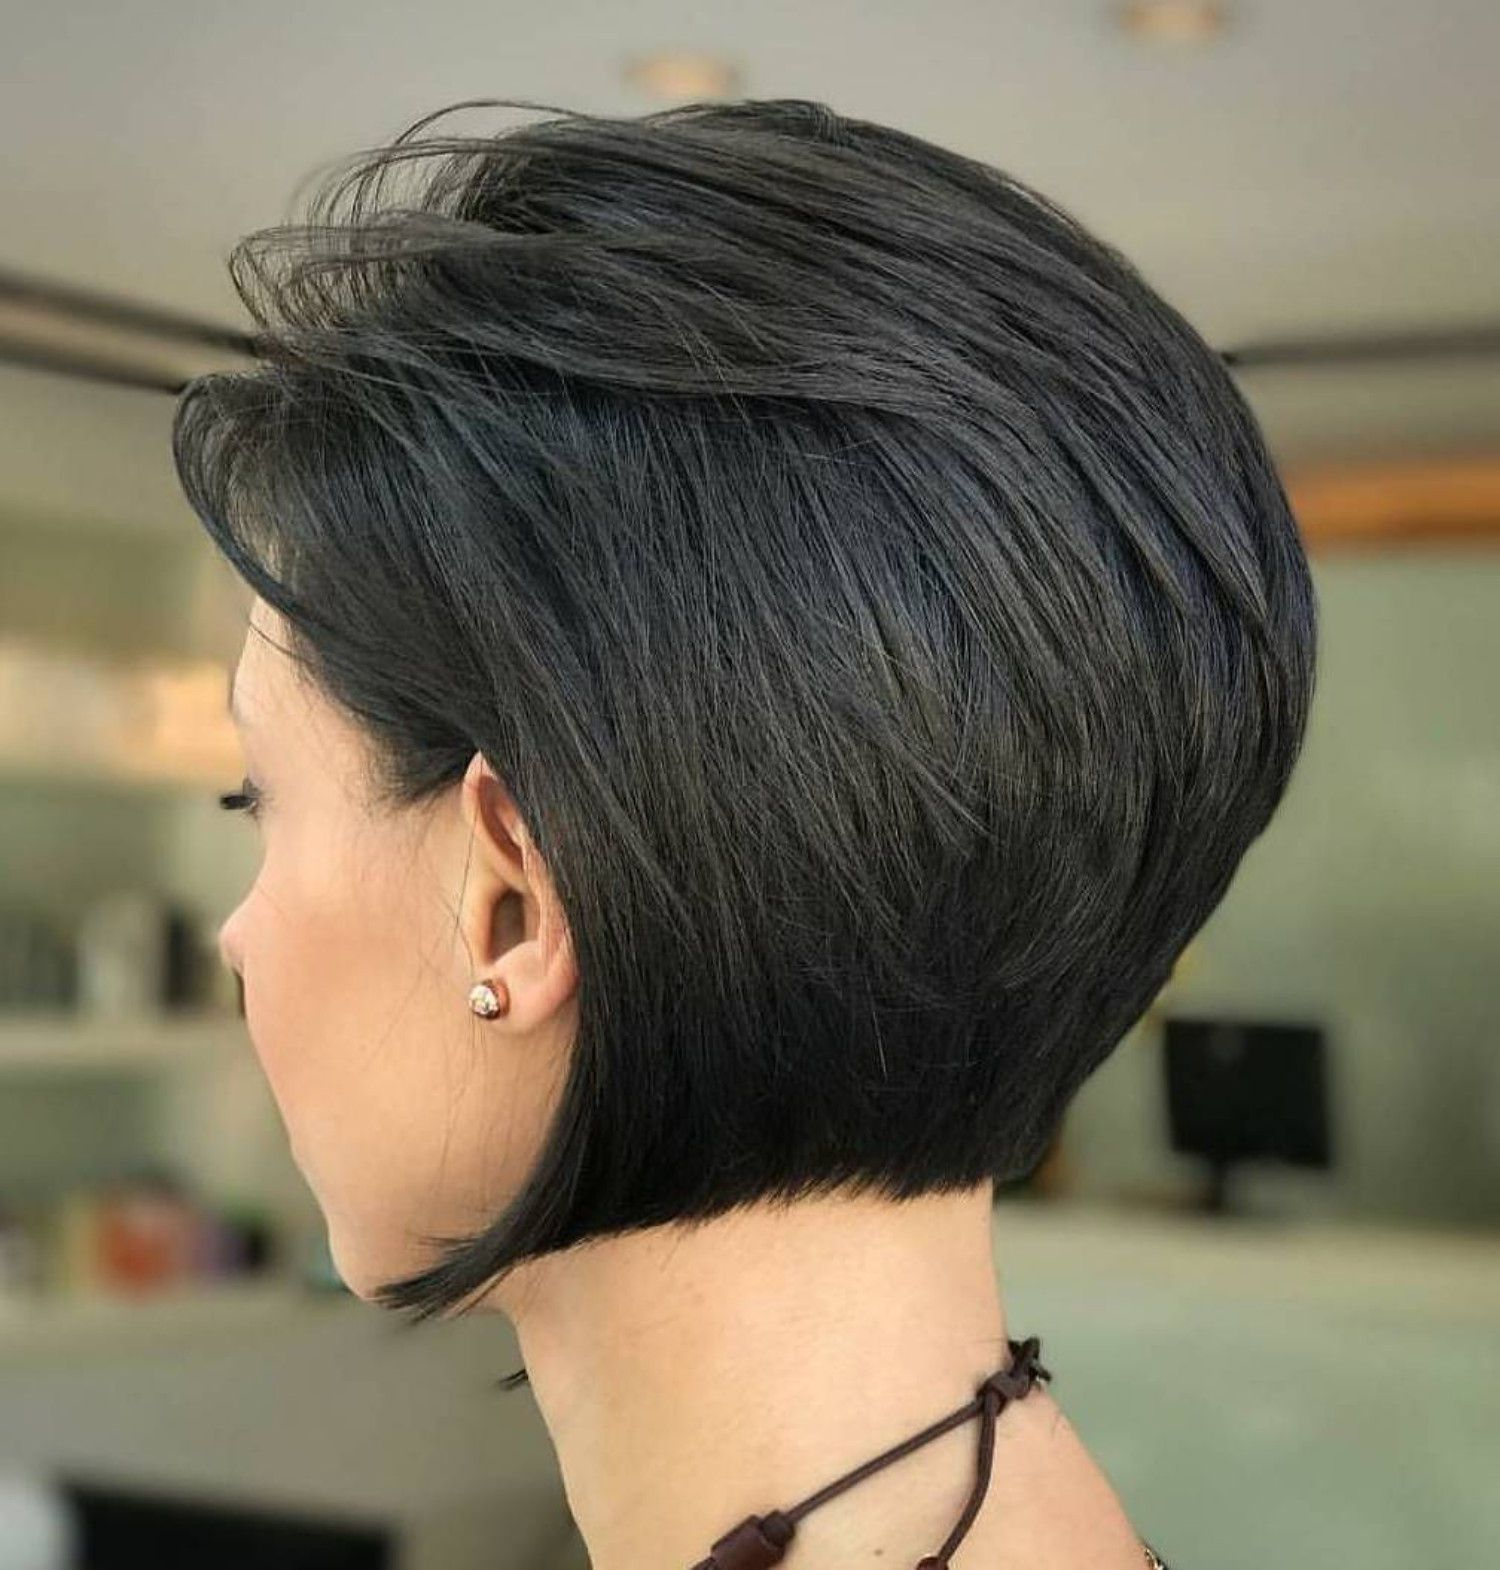 cute and easytostyle short layered hairstyles hair cut ideas